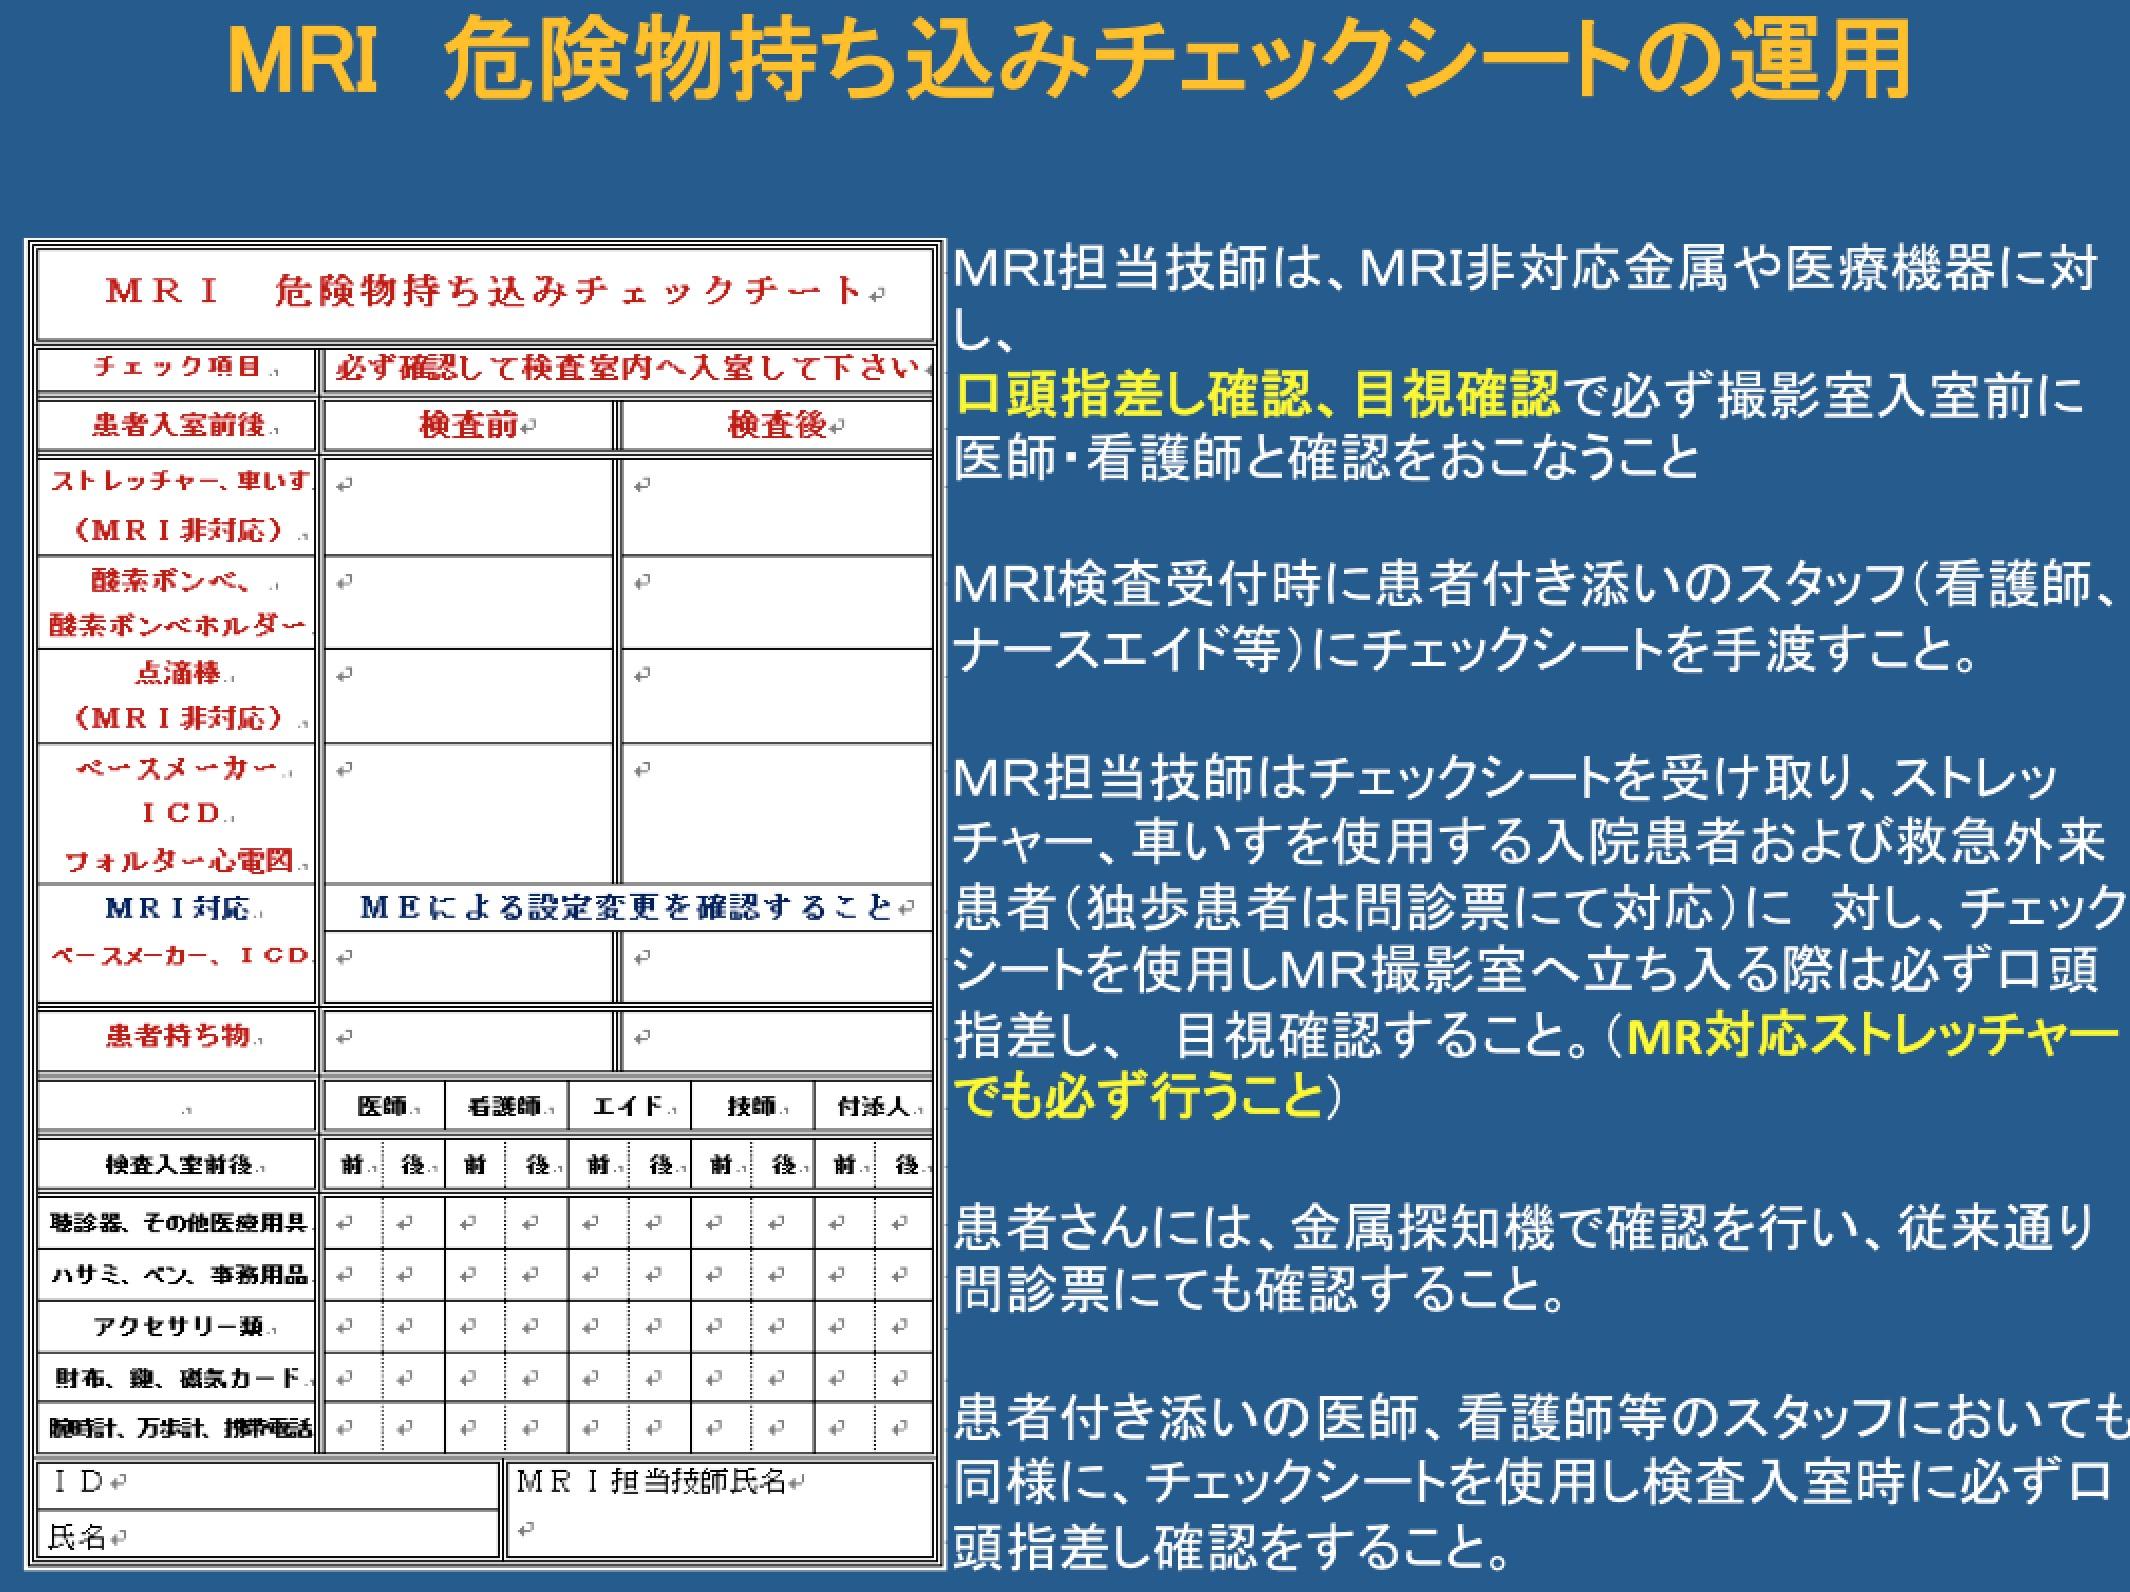 SC 2016-03-10 13.09.54